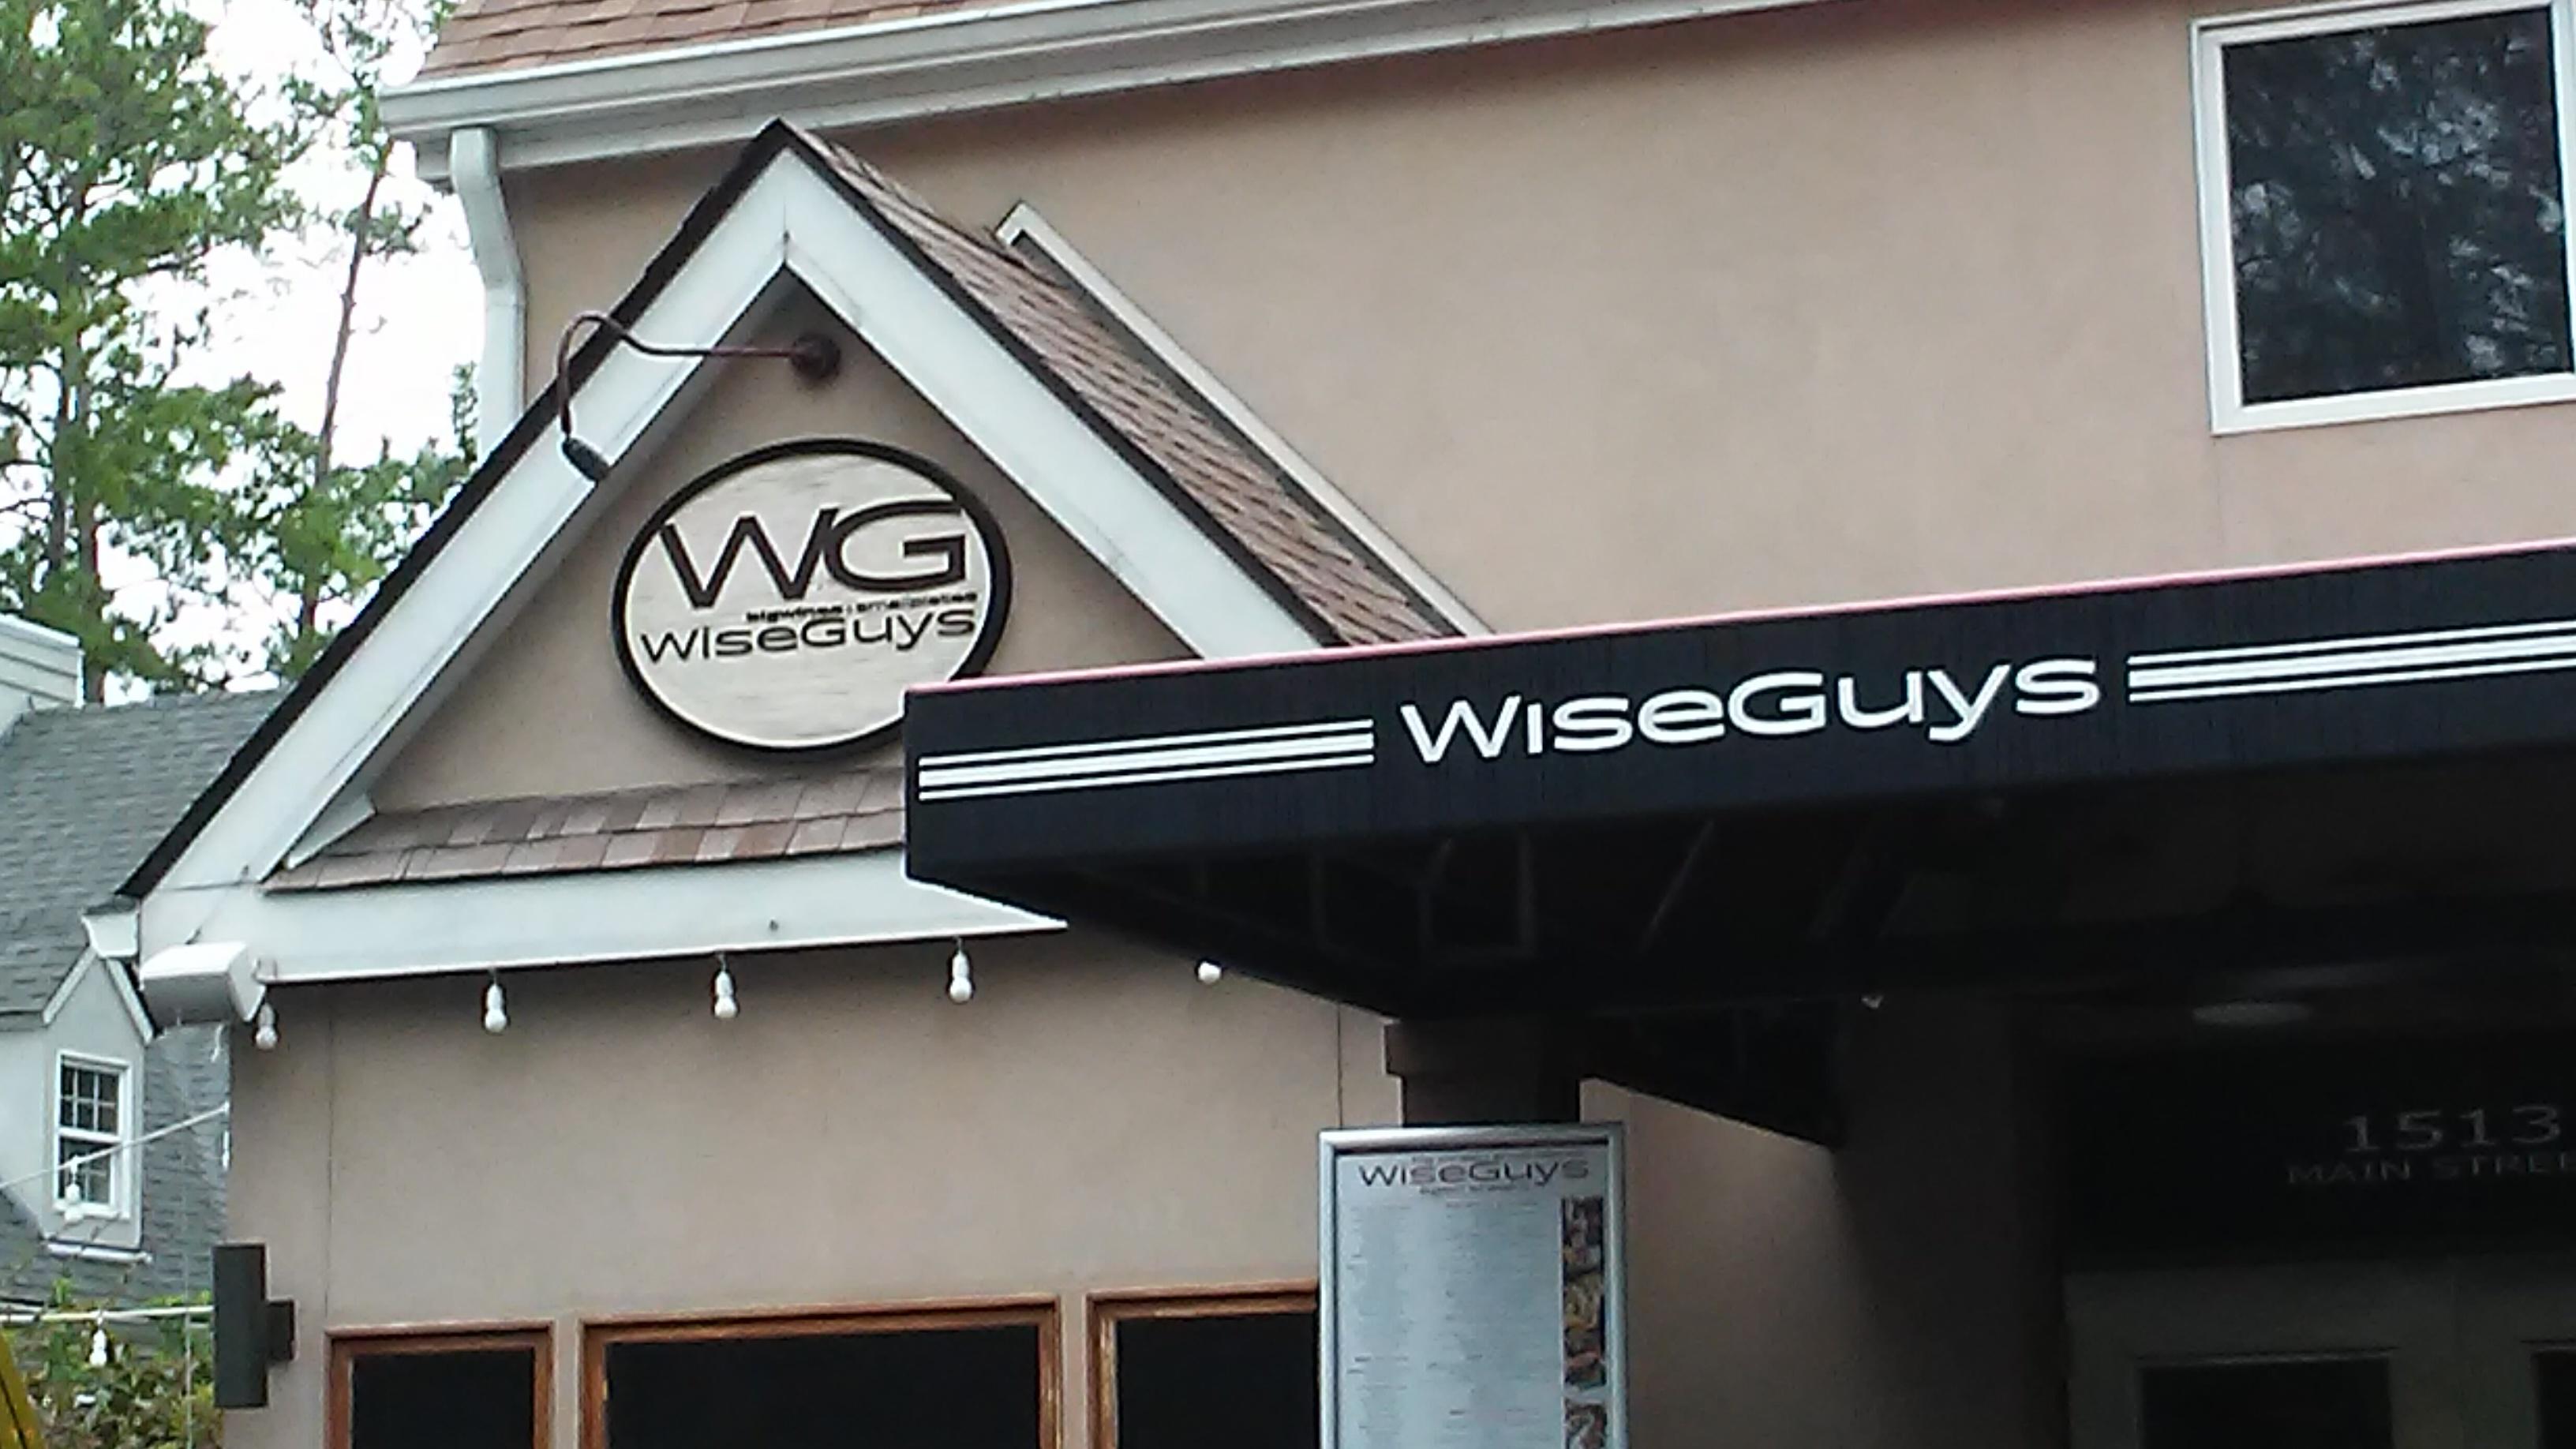 WiseGuys Hilton Head Island